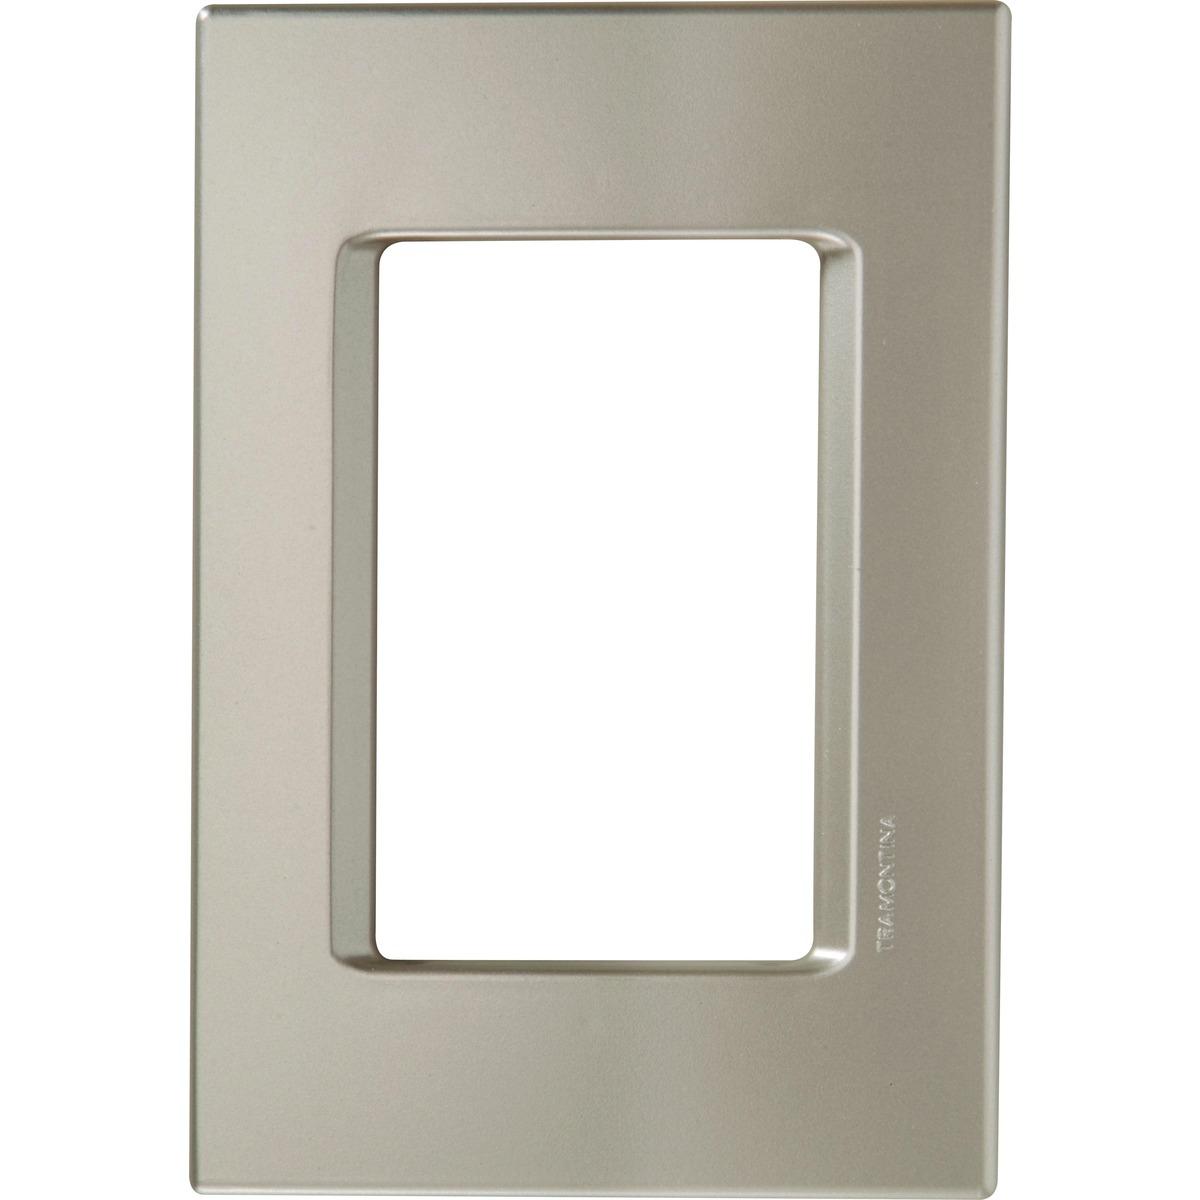 Placa 3P 4X2 Izy Flat Prata Perol 57104/023 Tramontina